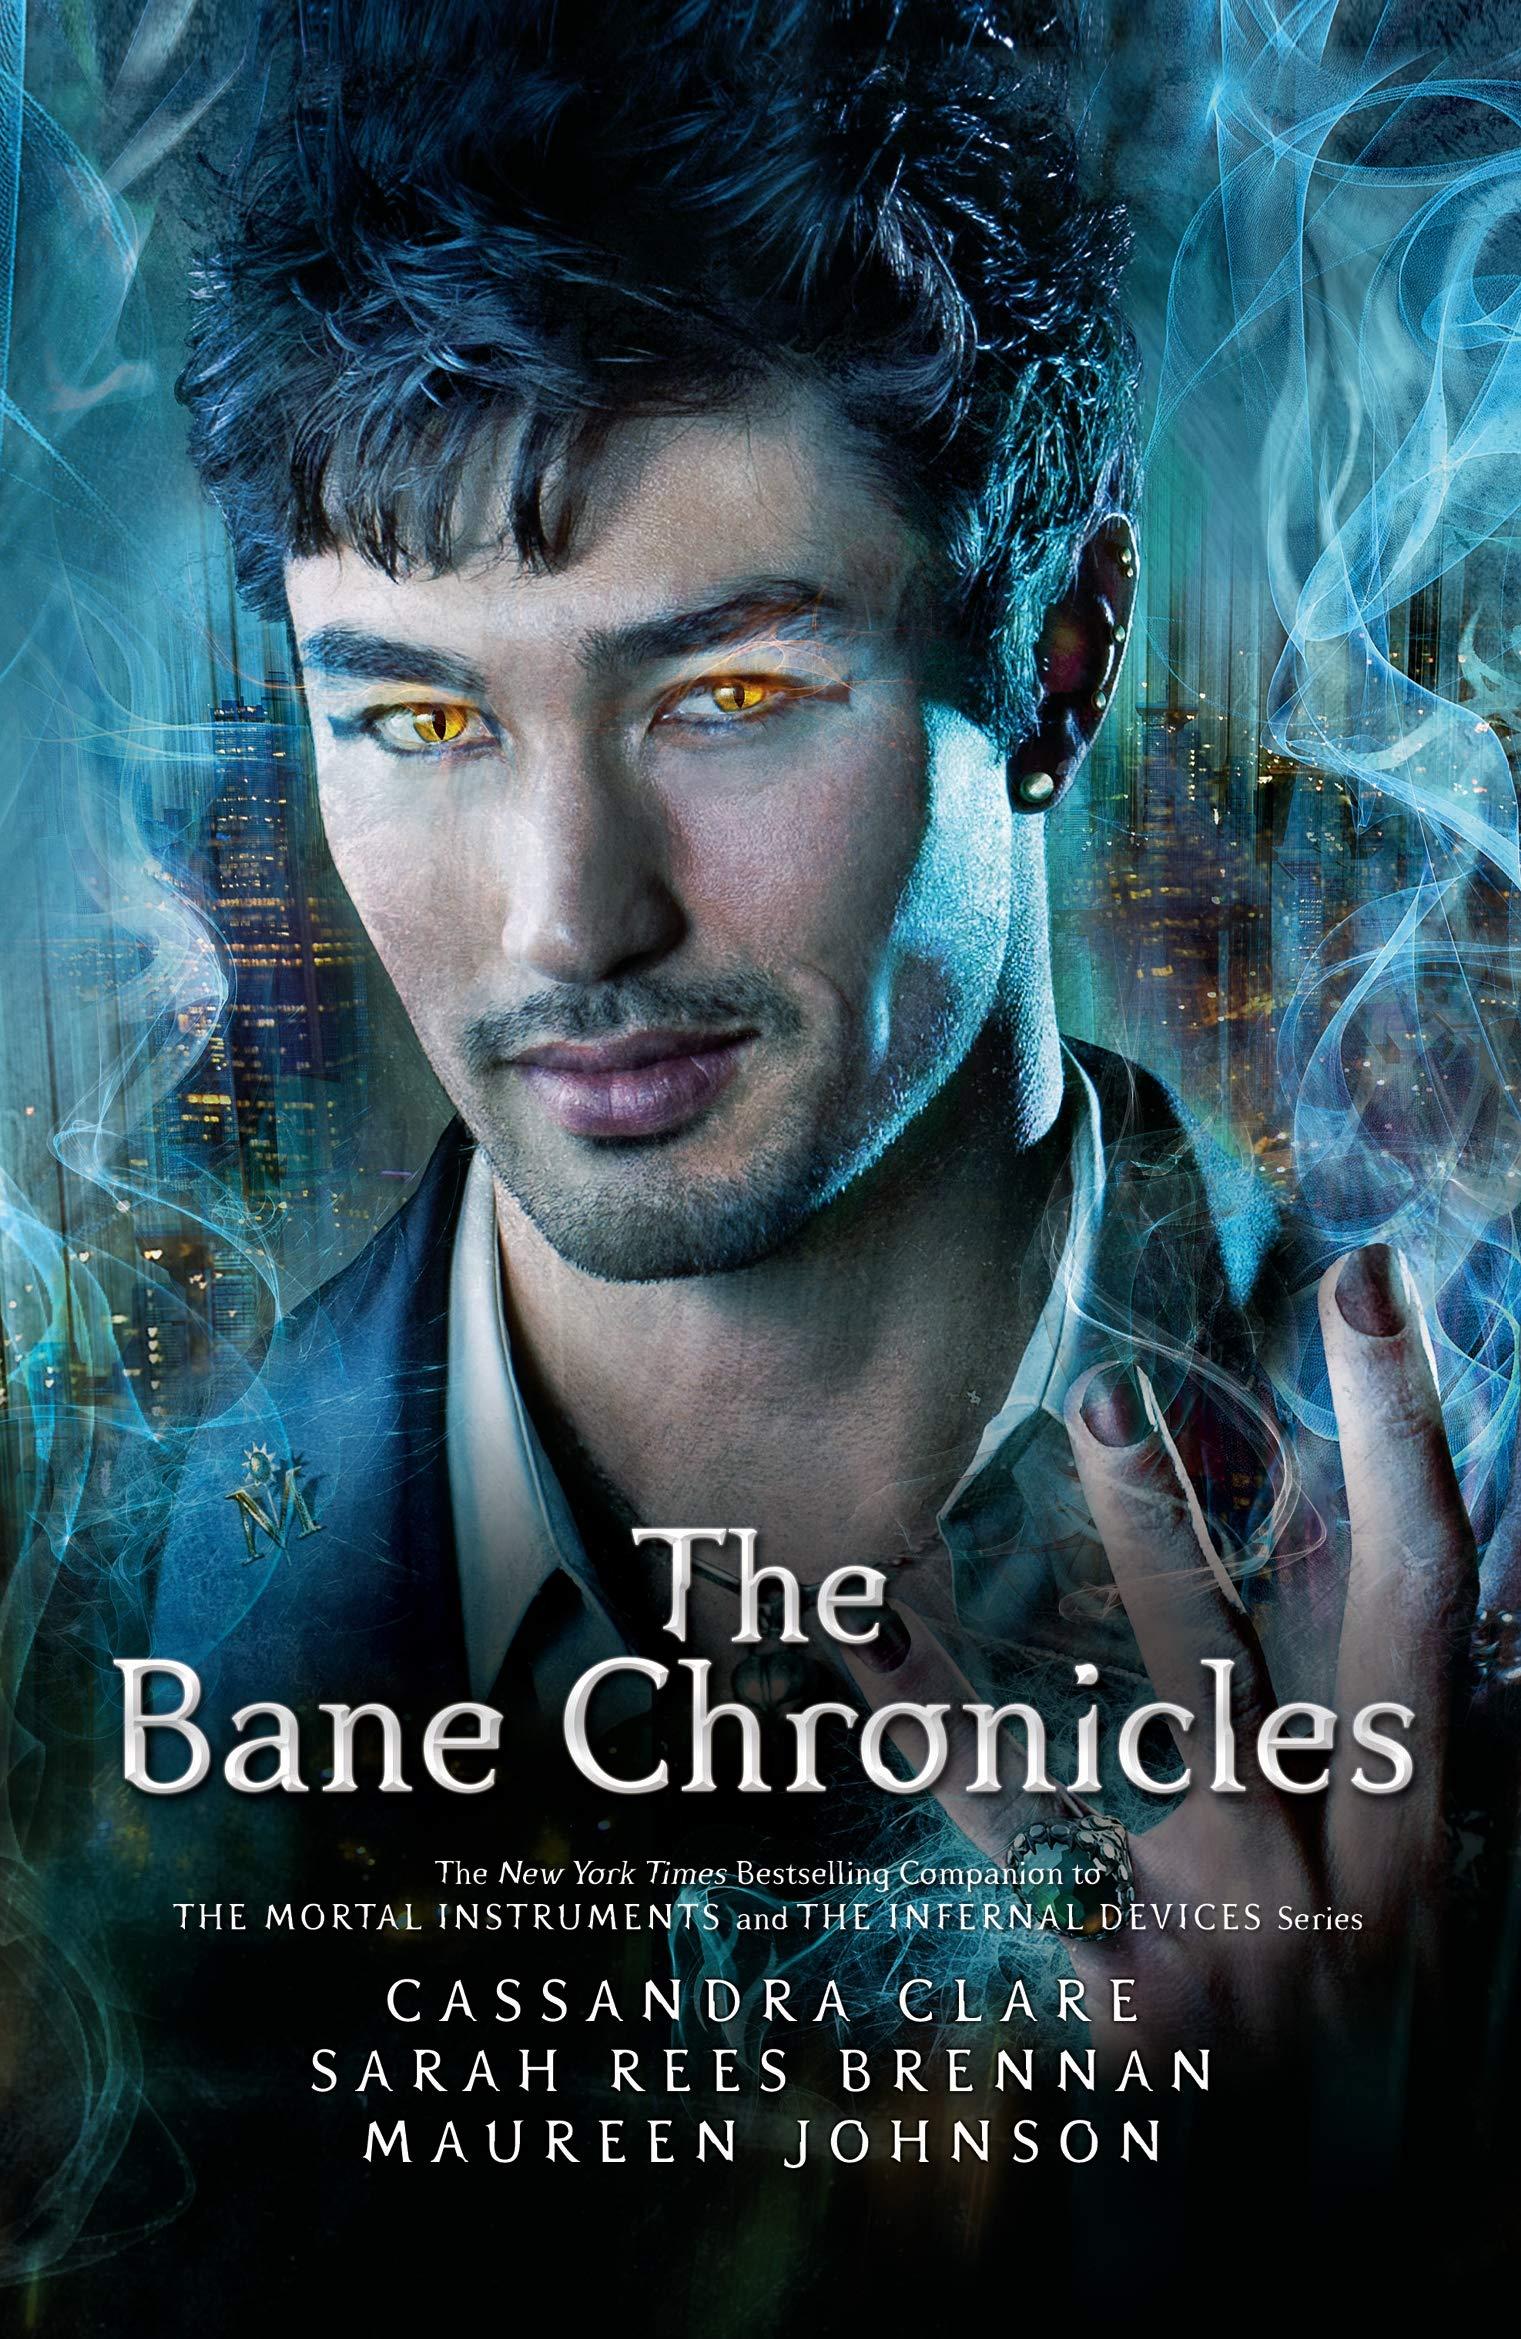 The Bane Chronicles: Amazon.co.uk: Clare, Cassandra, Brennan, Sarah Rees,  Johnson, Maureen: Books